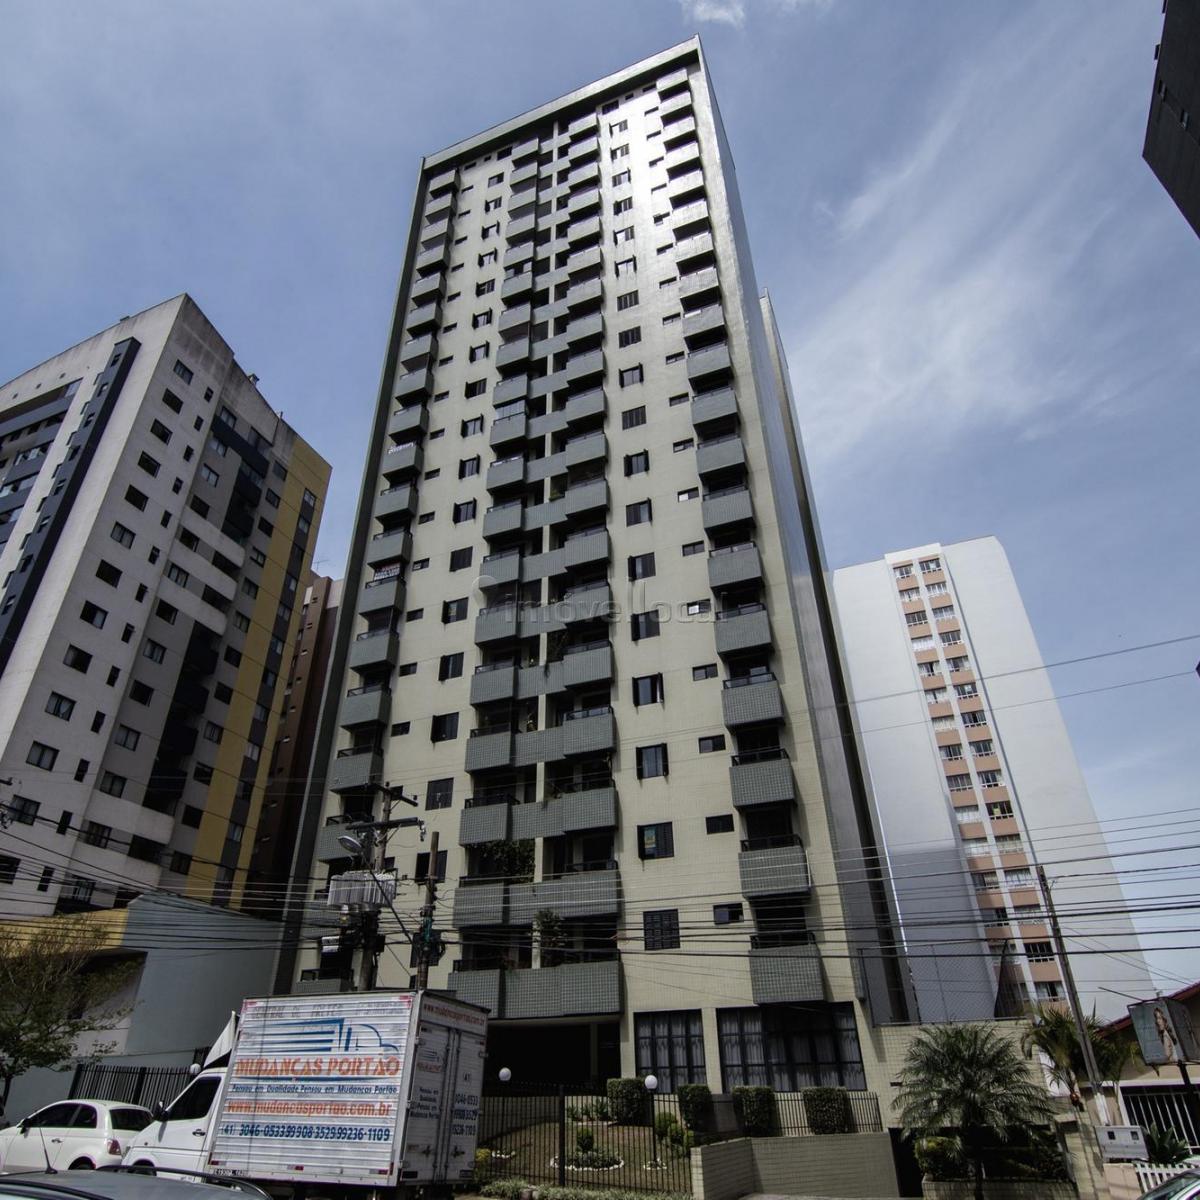 http://www.infocenterhost2.com.br/crm/fotosimovel/457643/106024431-apartamento-curitiba-portao.jpg